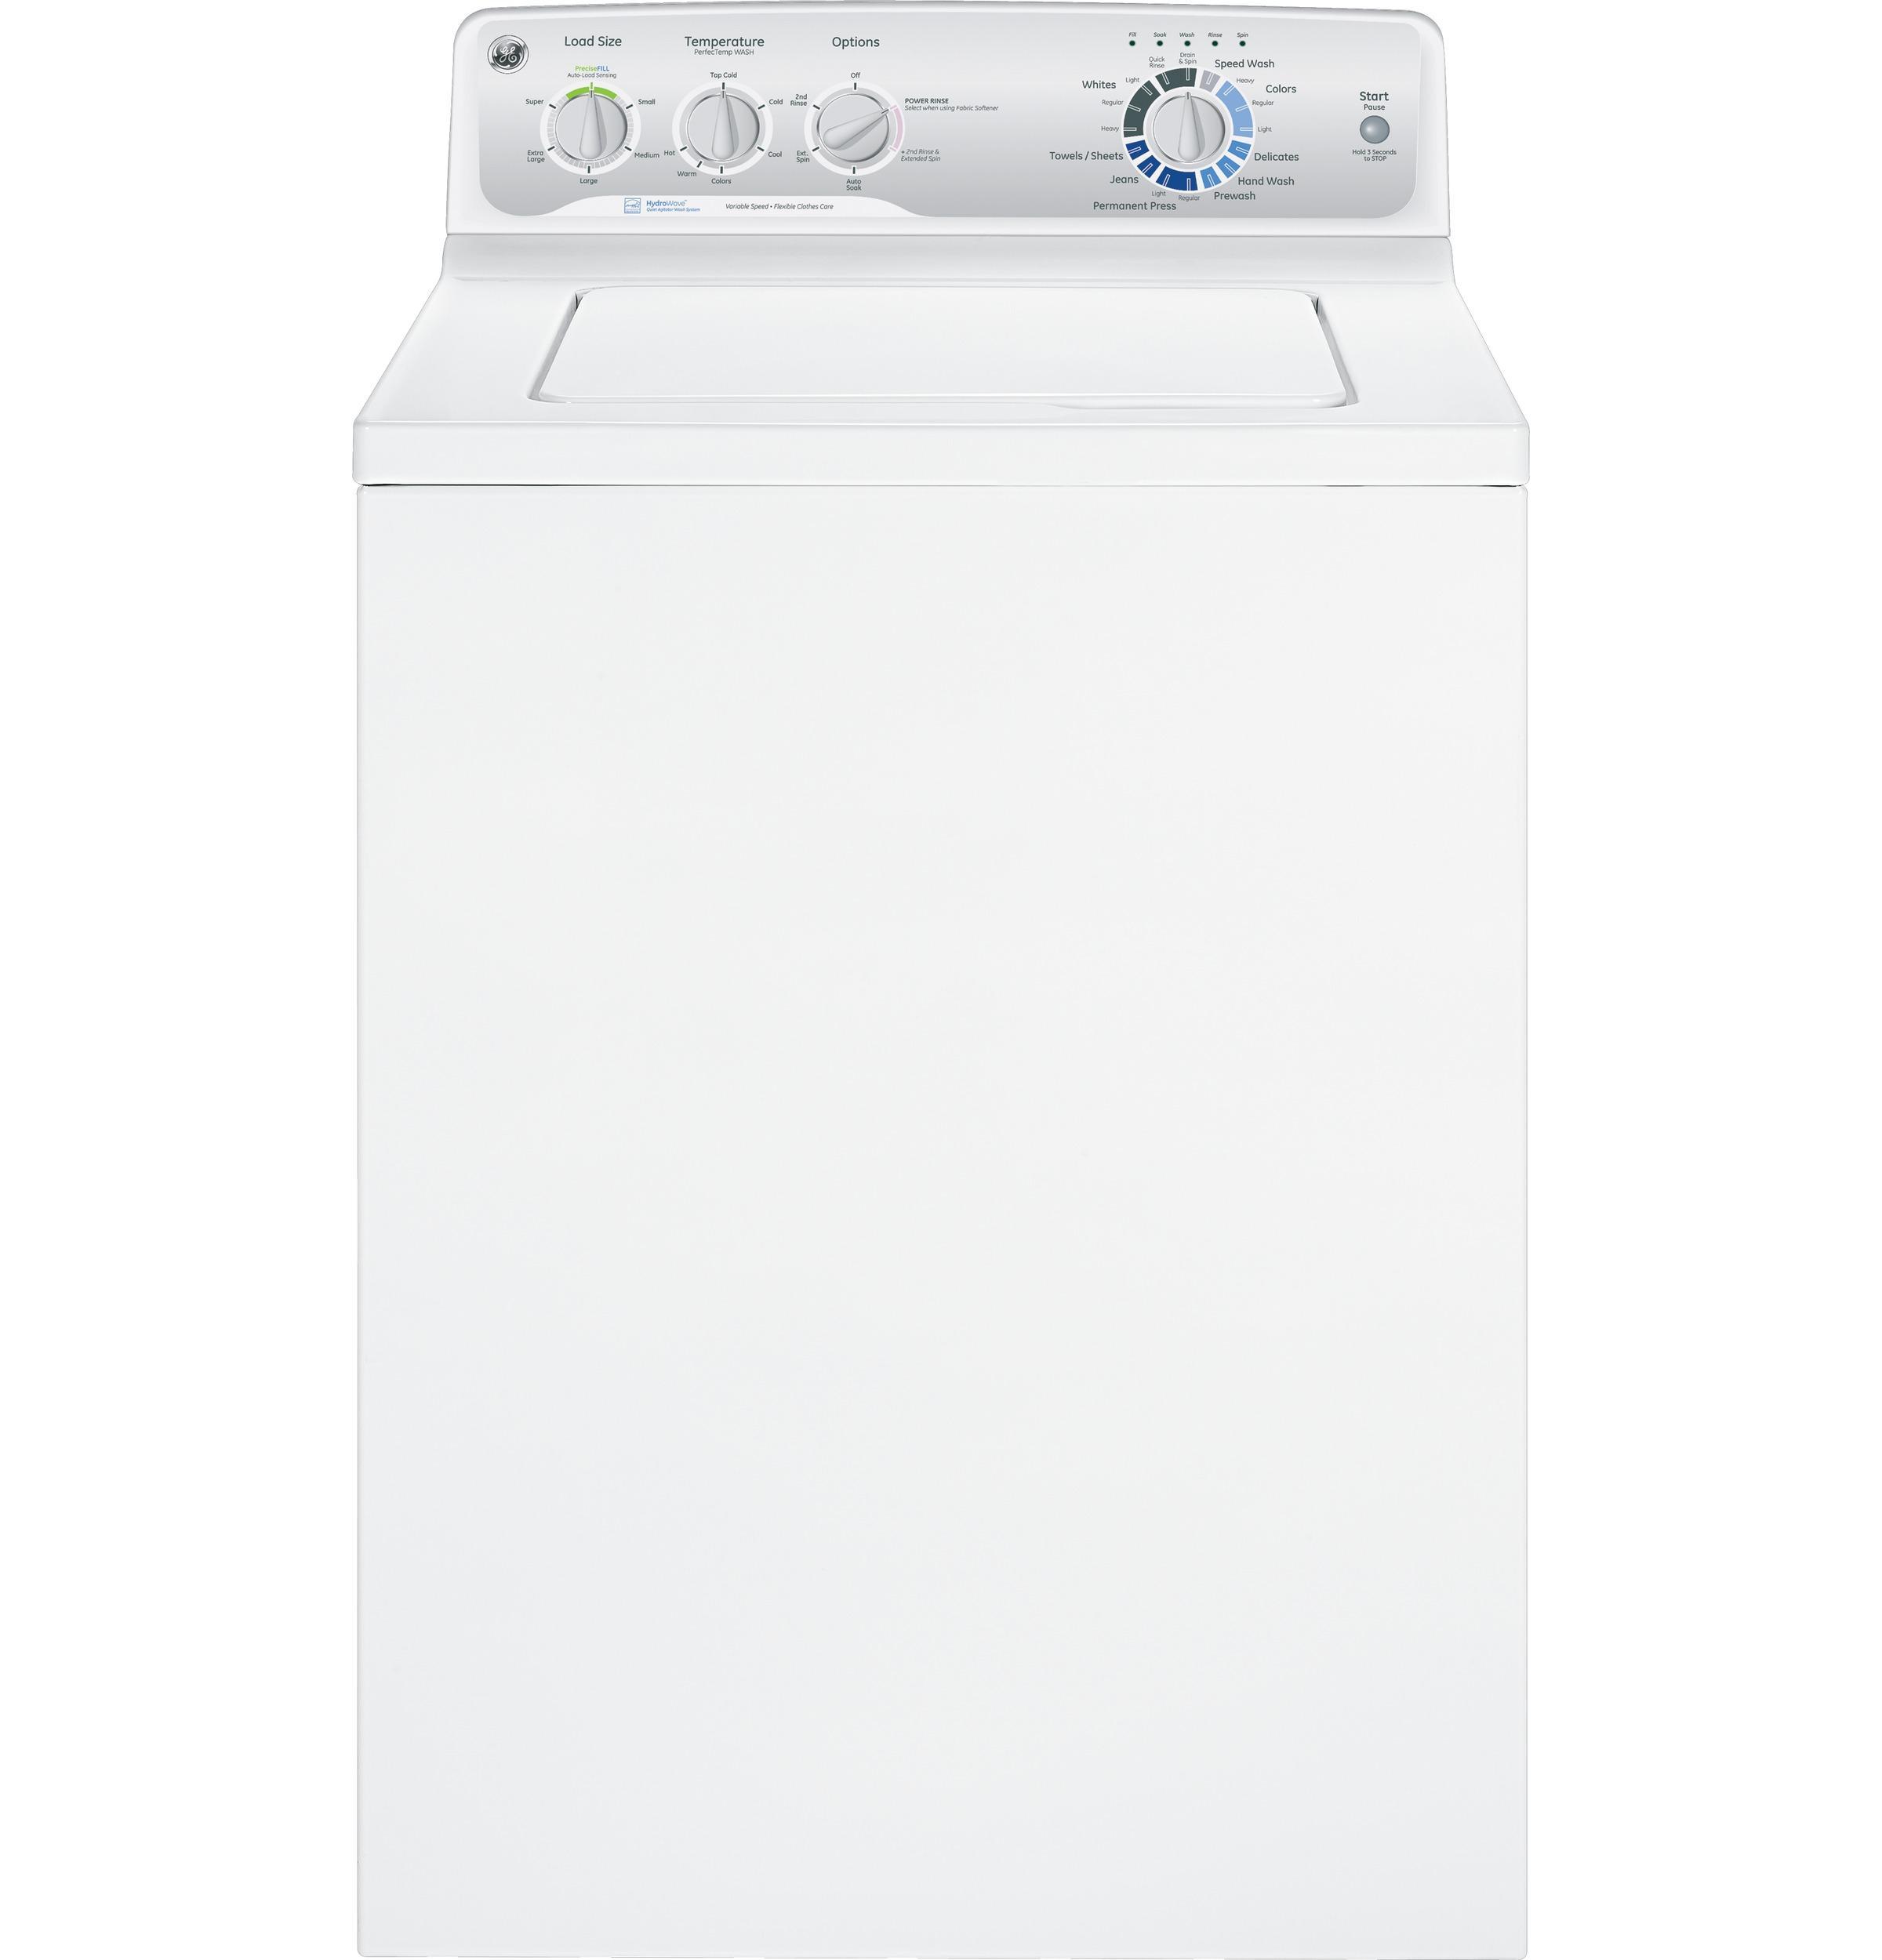 Gtwn4250dws General Electric Gtwn4250dws Top Load Washers